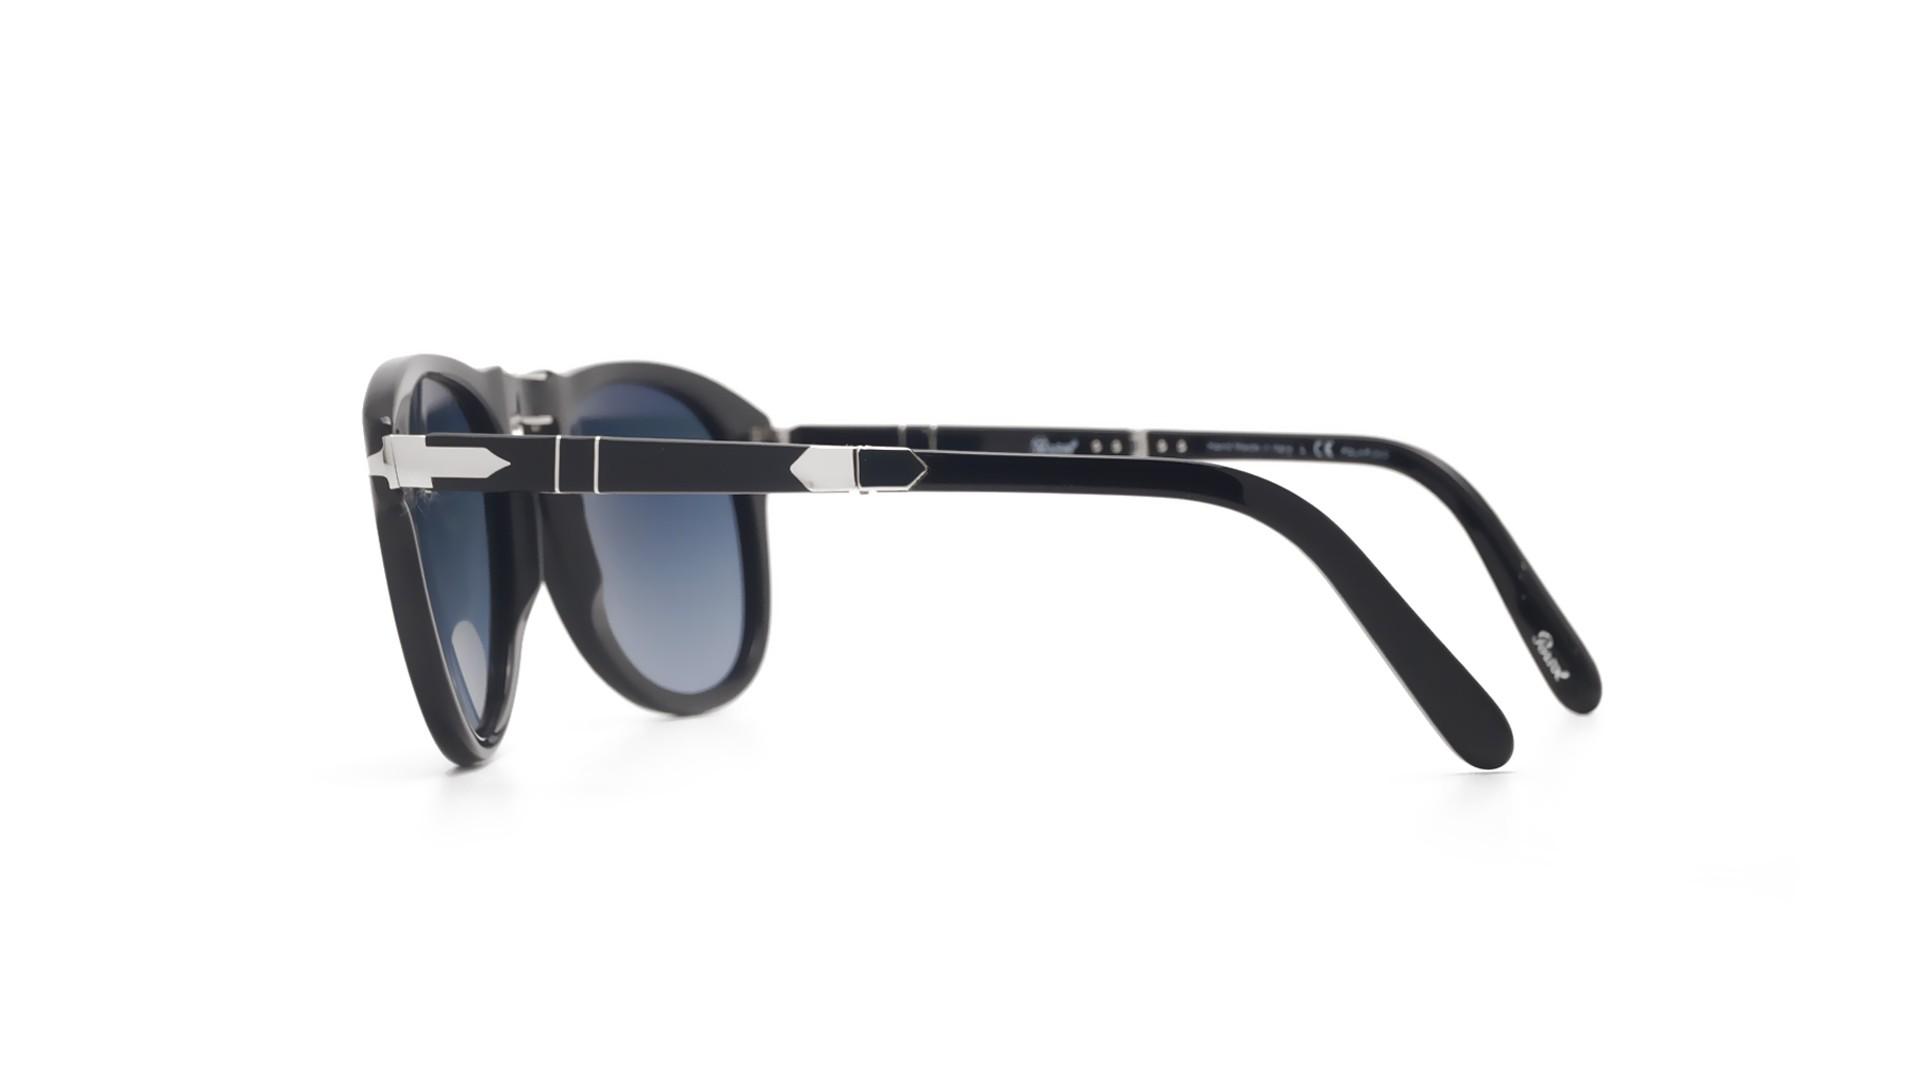 520e11d042 Sunglasses Persol Steve Mcqueen Black PO0714SM 95 S3 54-21 Large Folding  Polarized Gradient